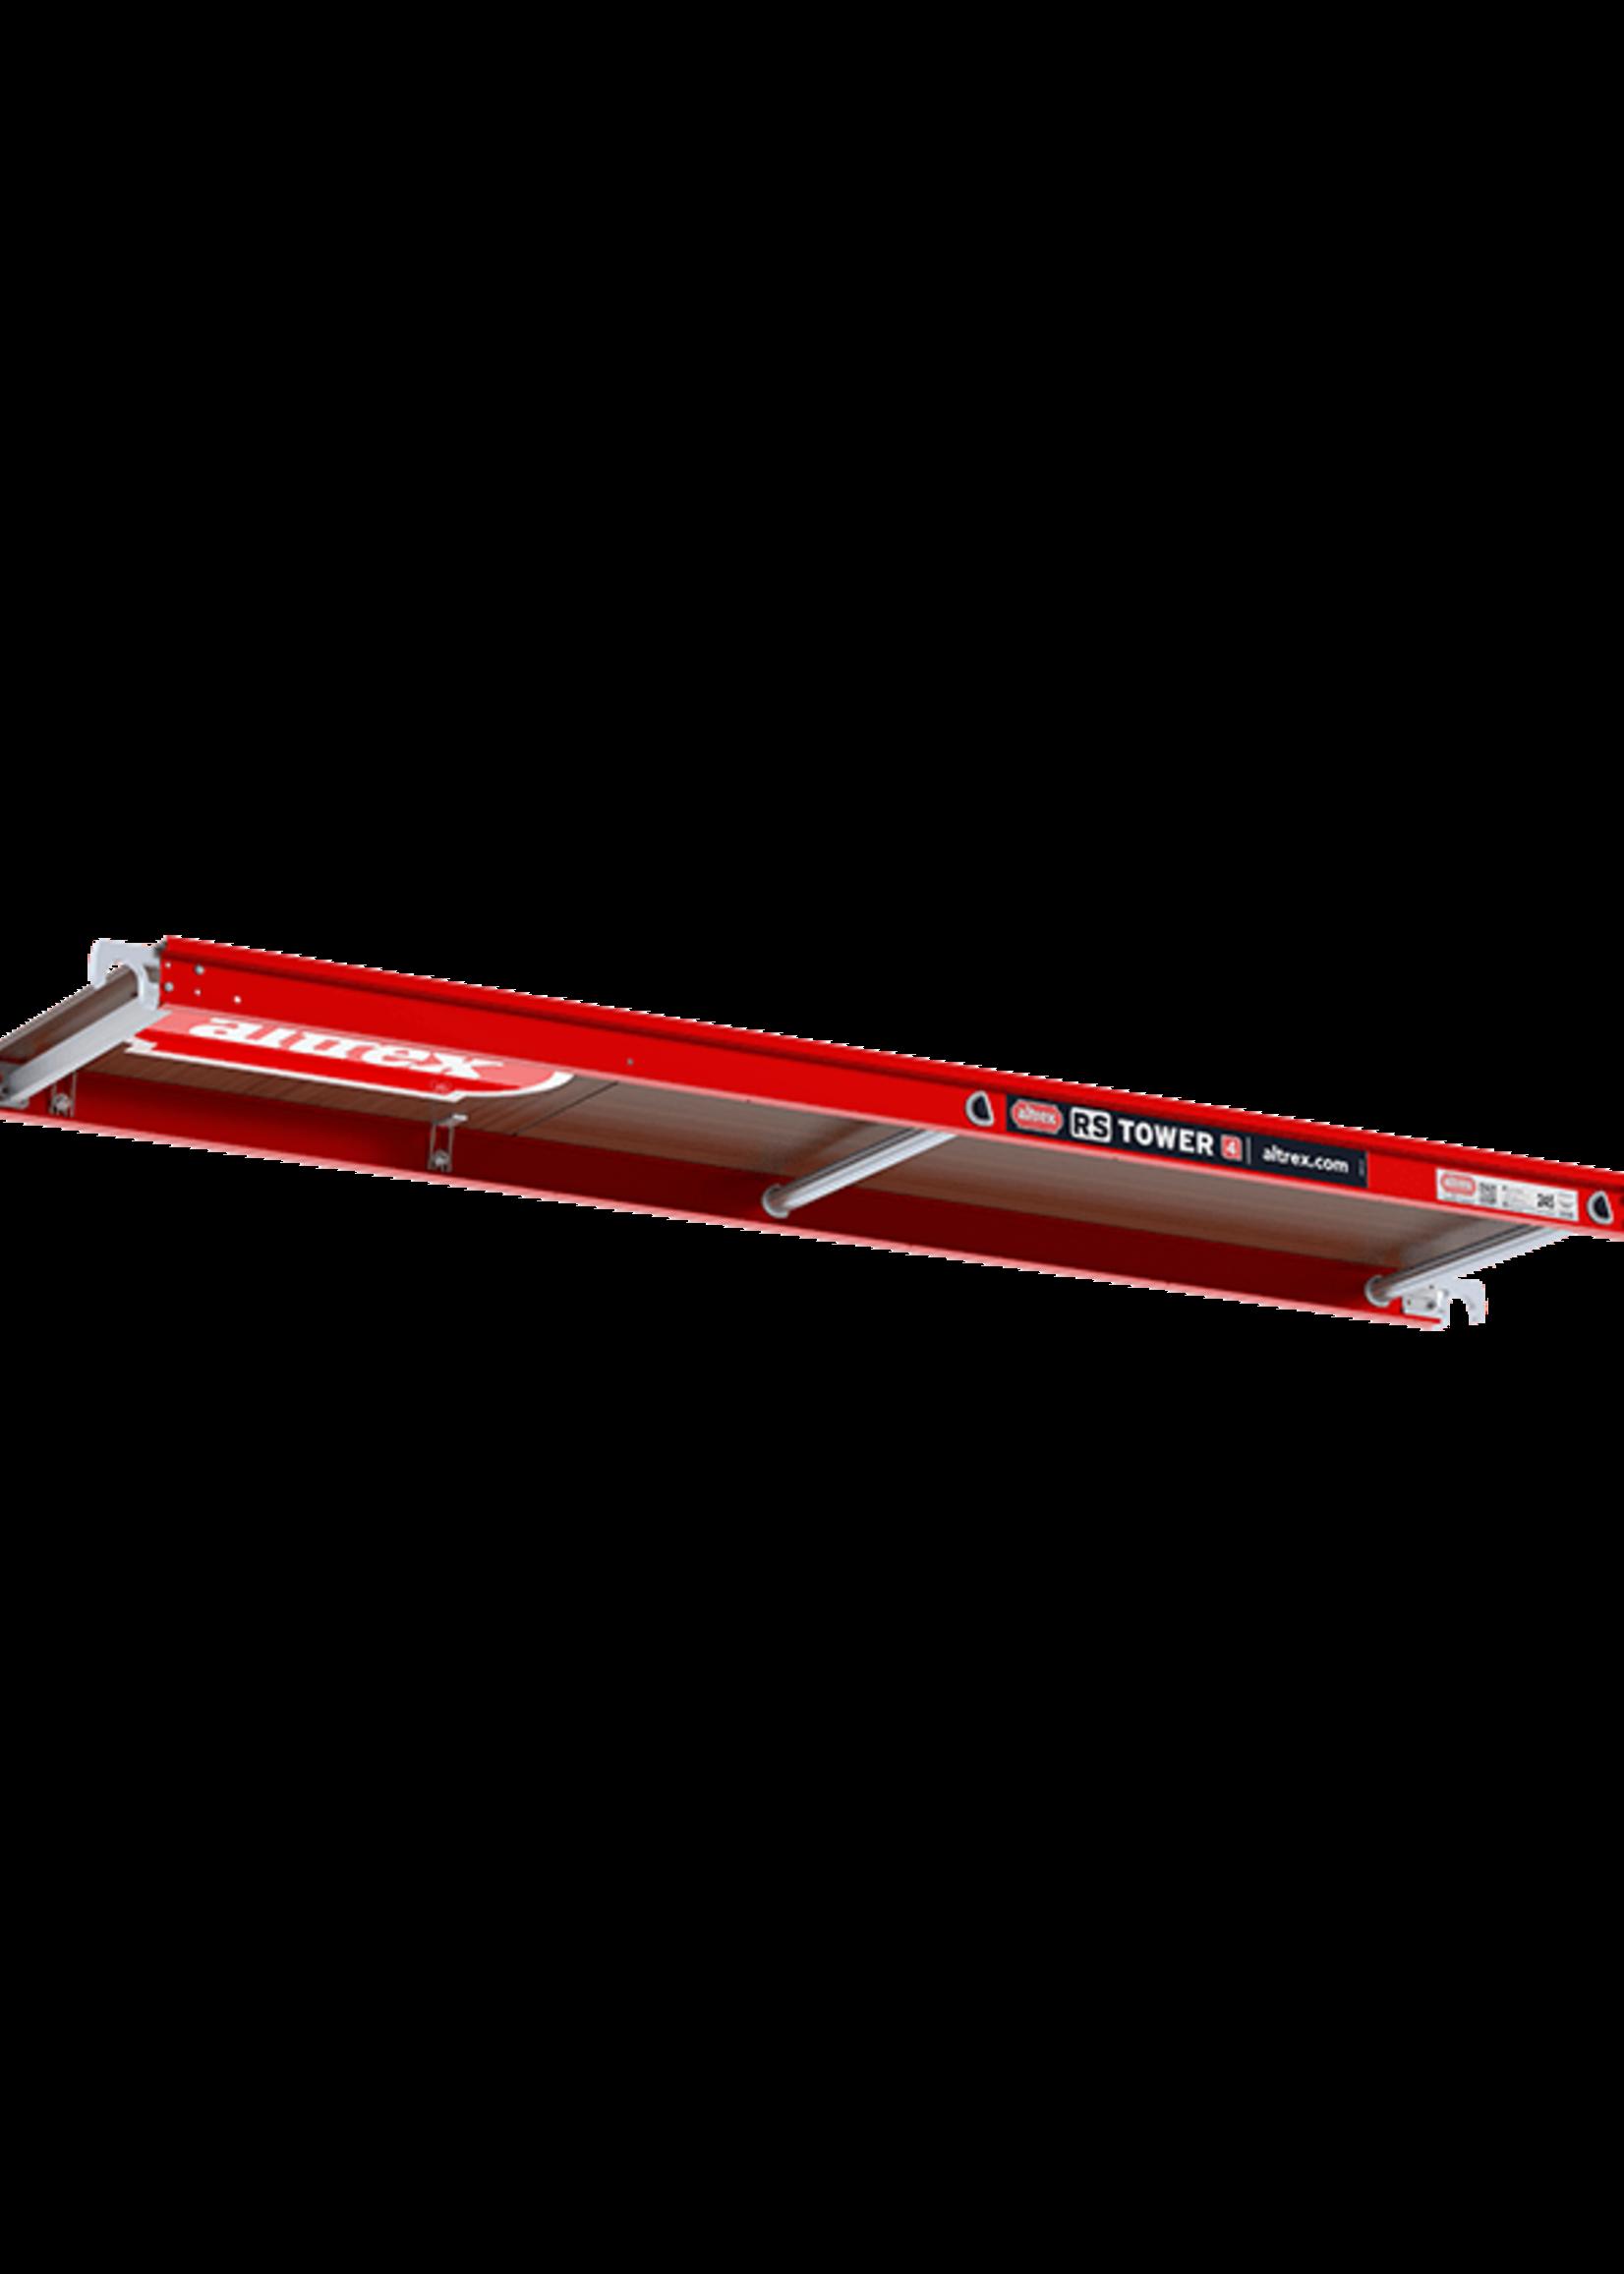 Altrex platform hout zonder luik 3.05m rs tower 5-serie